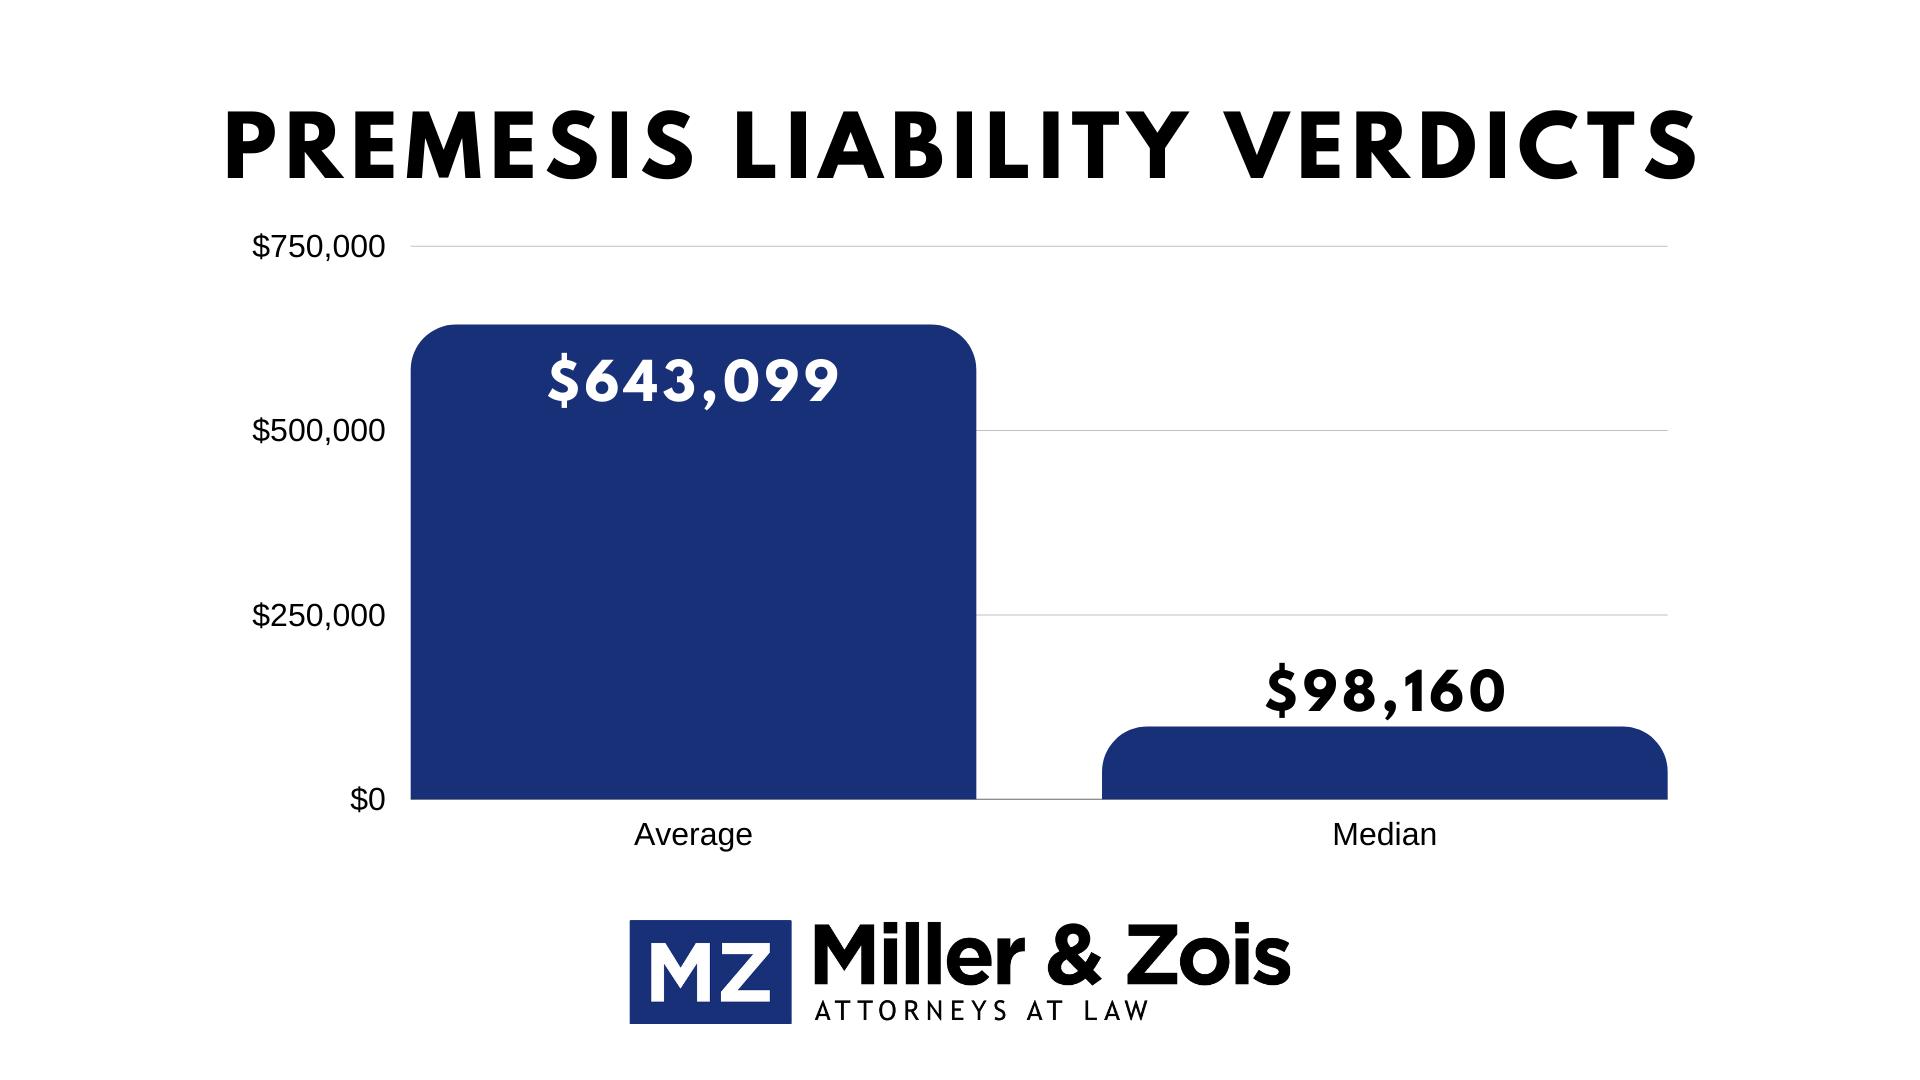 Premises Liability Verdicts